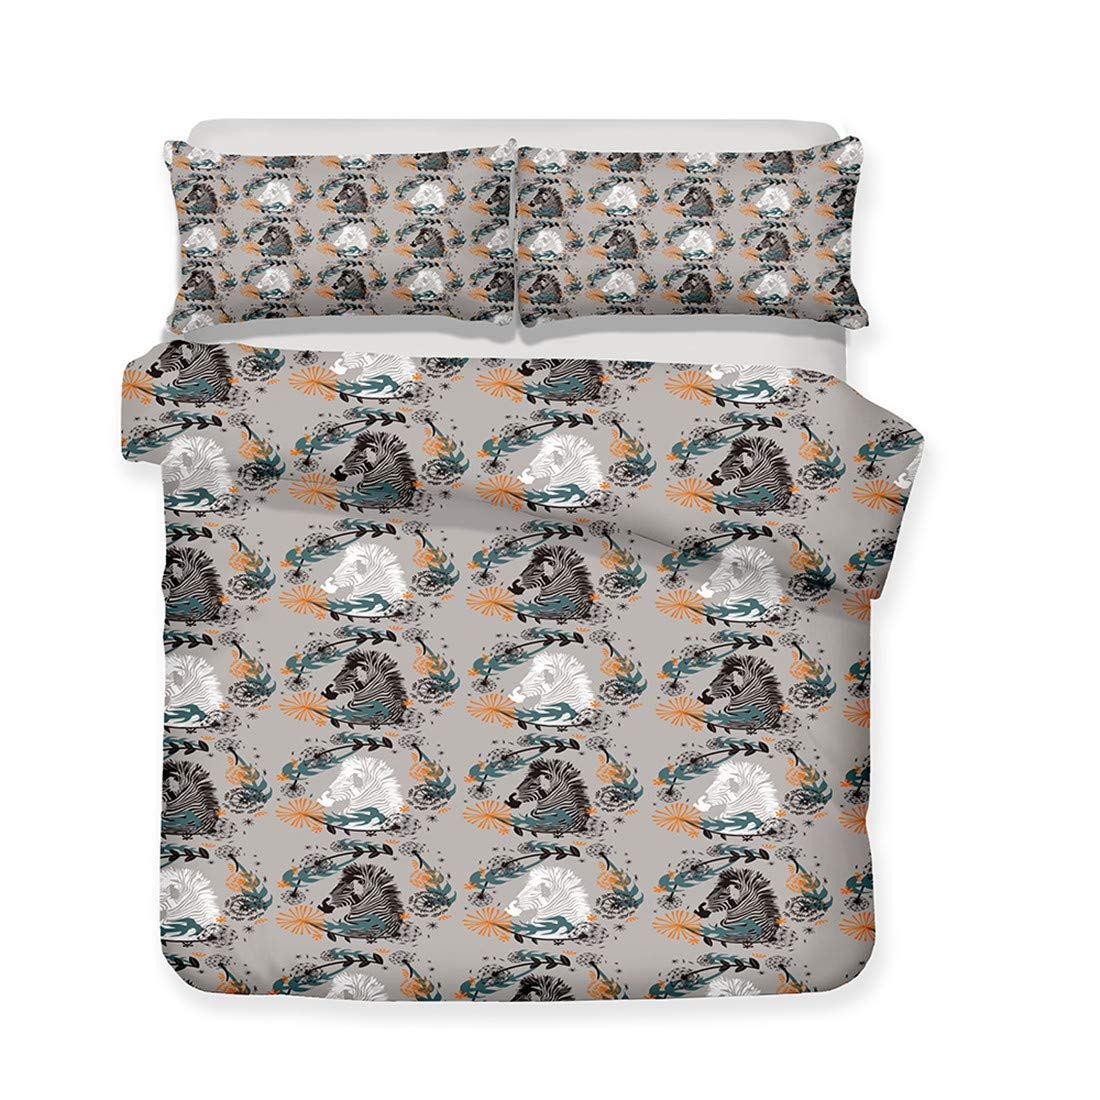 Mrsrui Twin Bedding Cover Set 3 Piece Set (1 Qulit 1 Cover + 1 Pillow Shams) Luxury Hypoallergenic Best Style for Men Women by Mrsrui